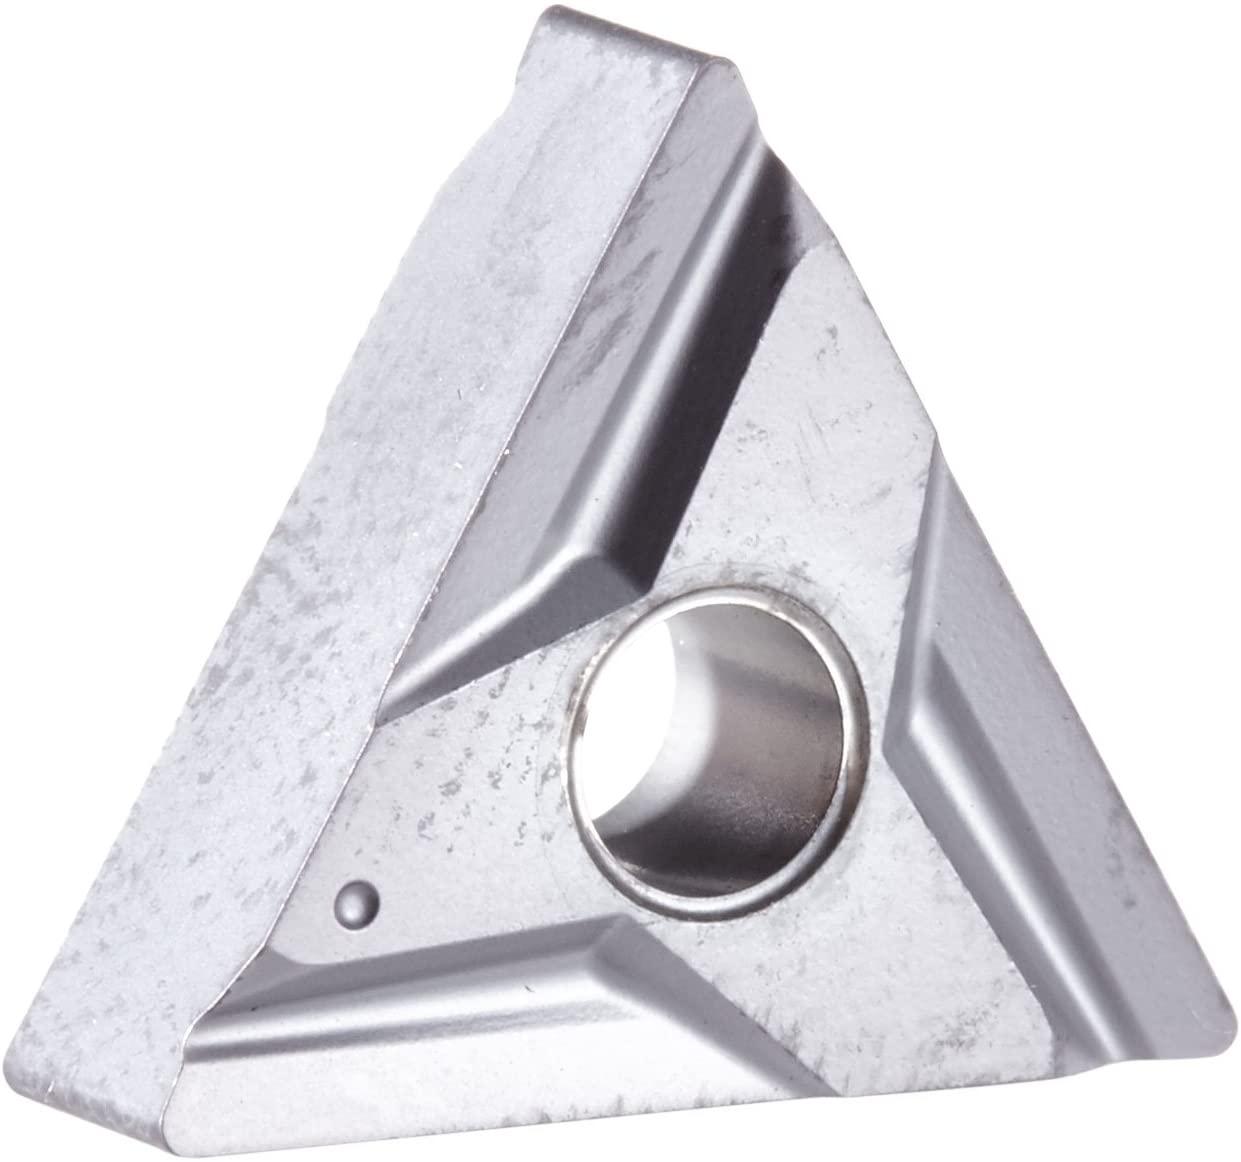 Lamina T0001125B Reversible Chopping Board WSP Tnux 160404R LT 10Quality Basic, Pieces